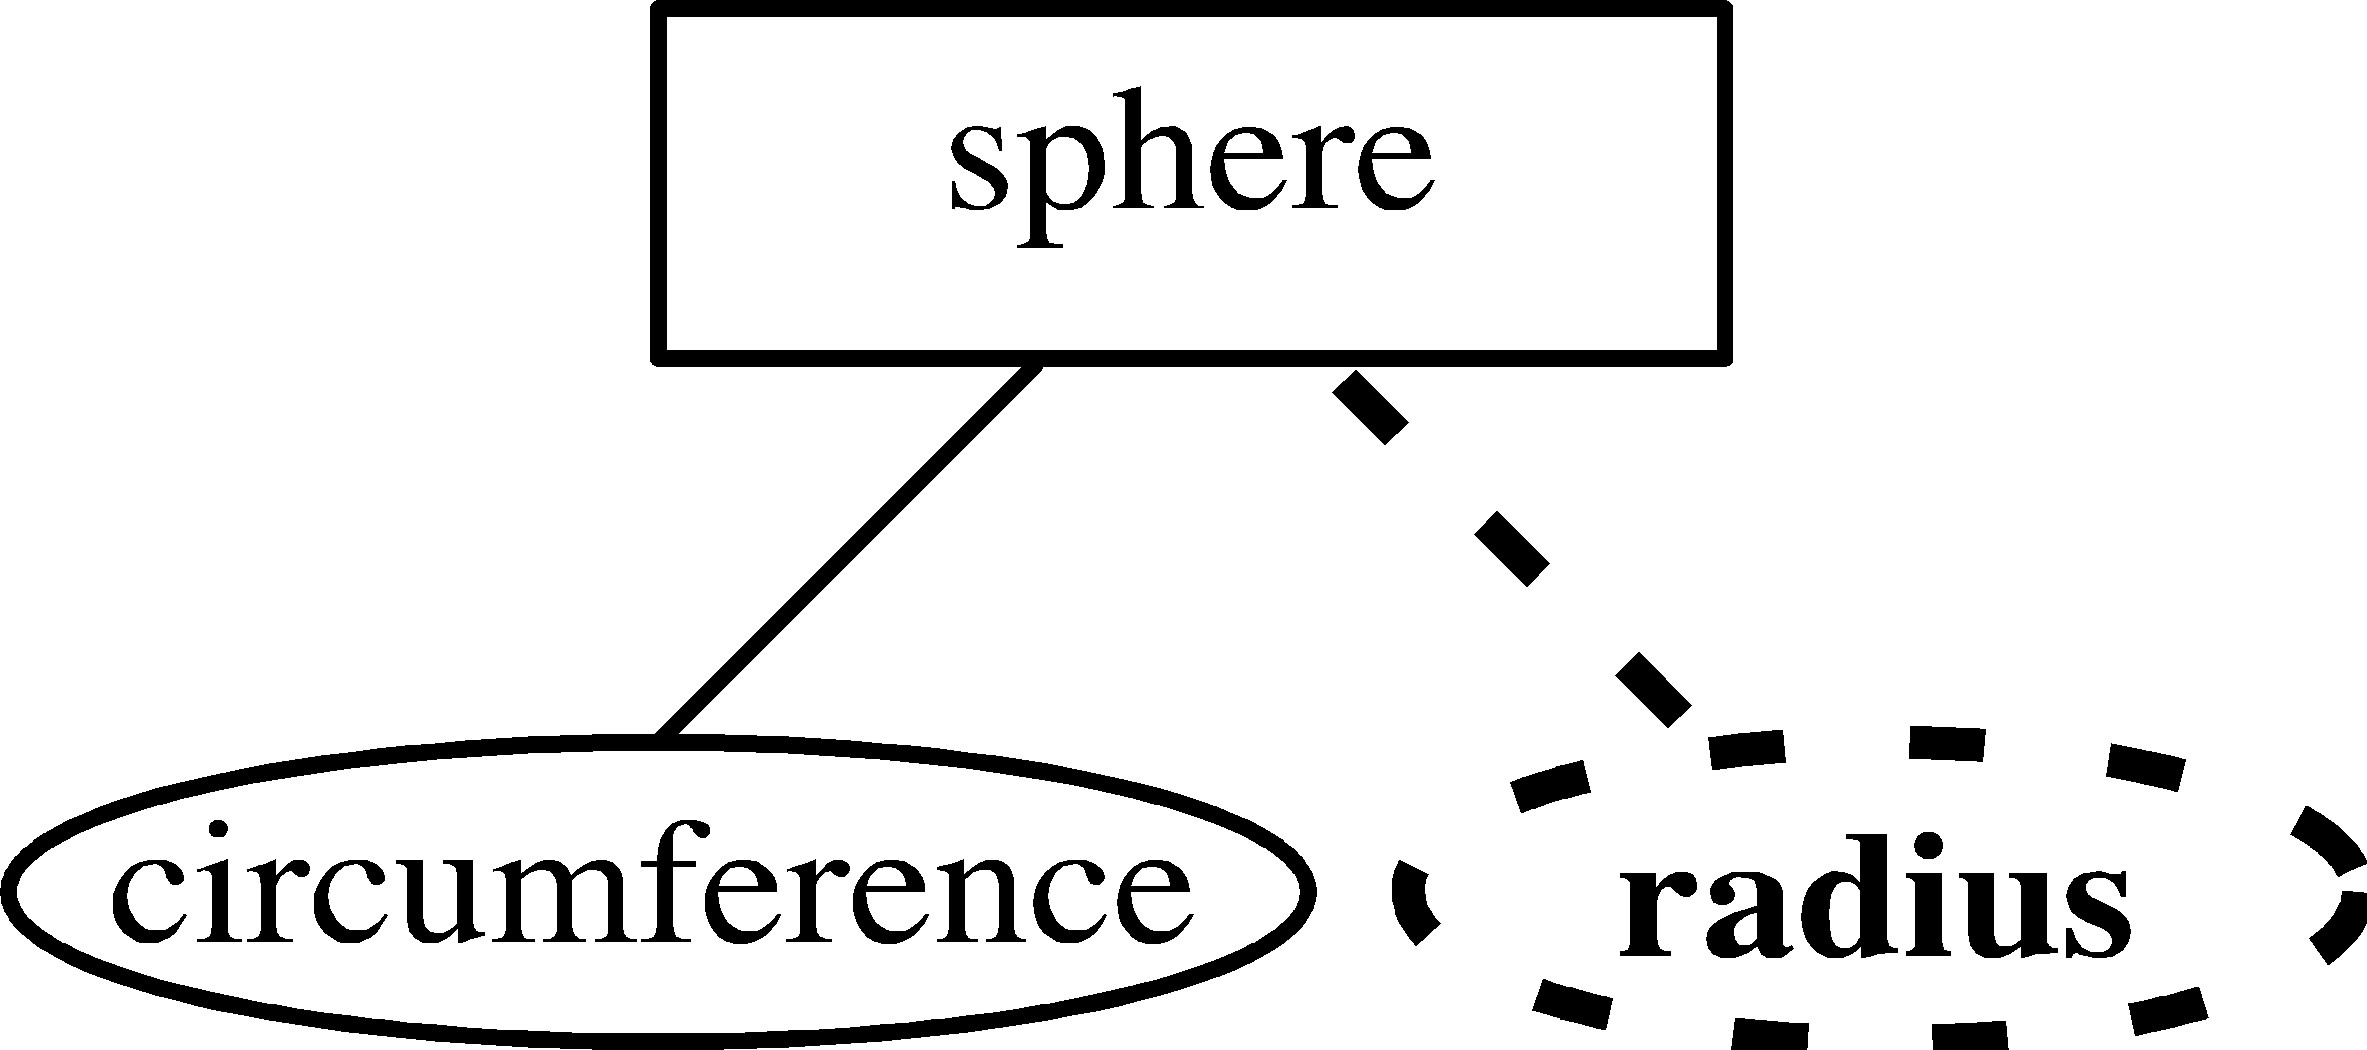 Entity-Relationship Model with regard to Er Diagram Recursive Relationship